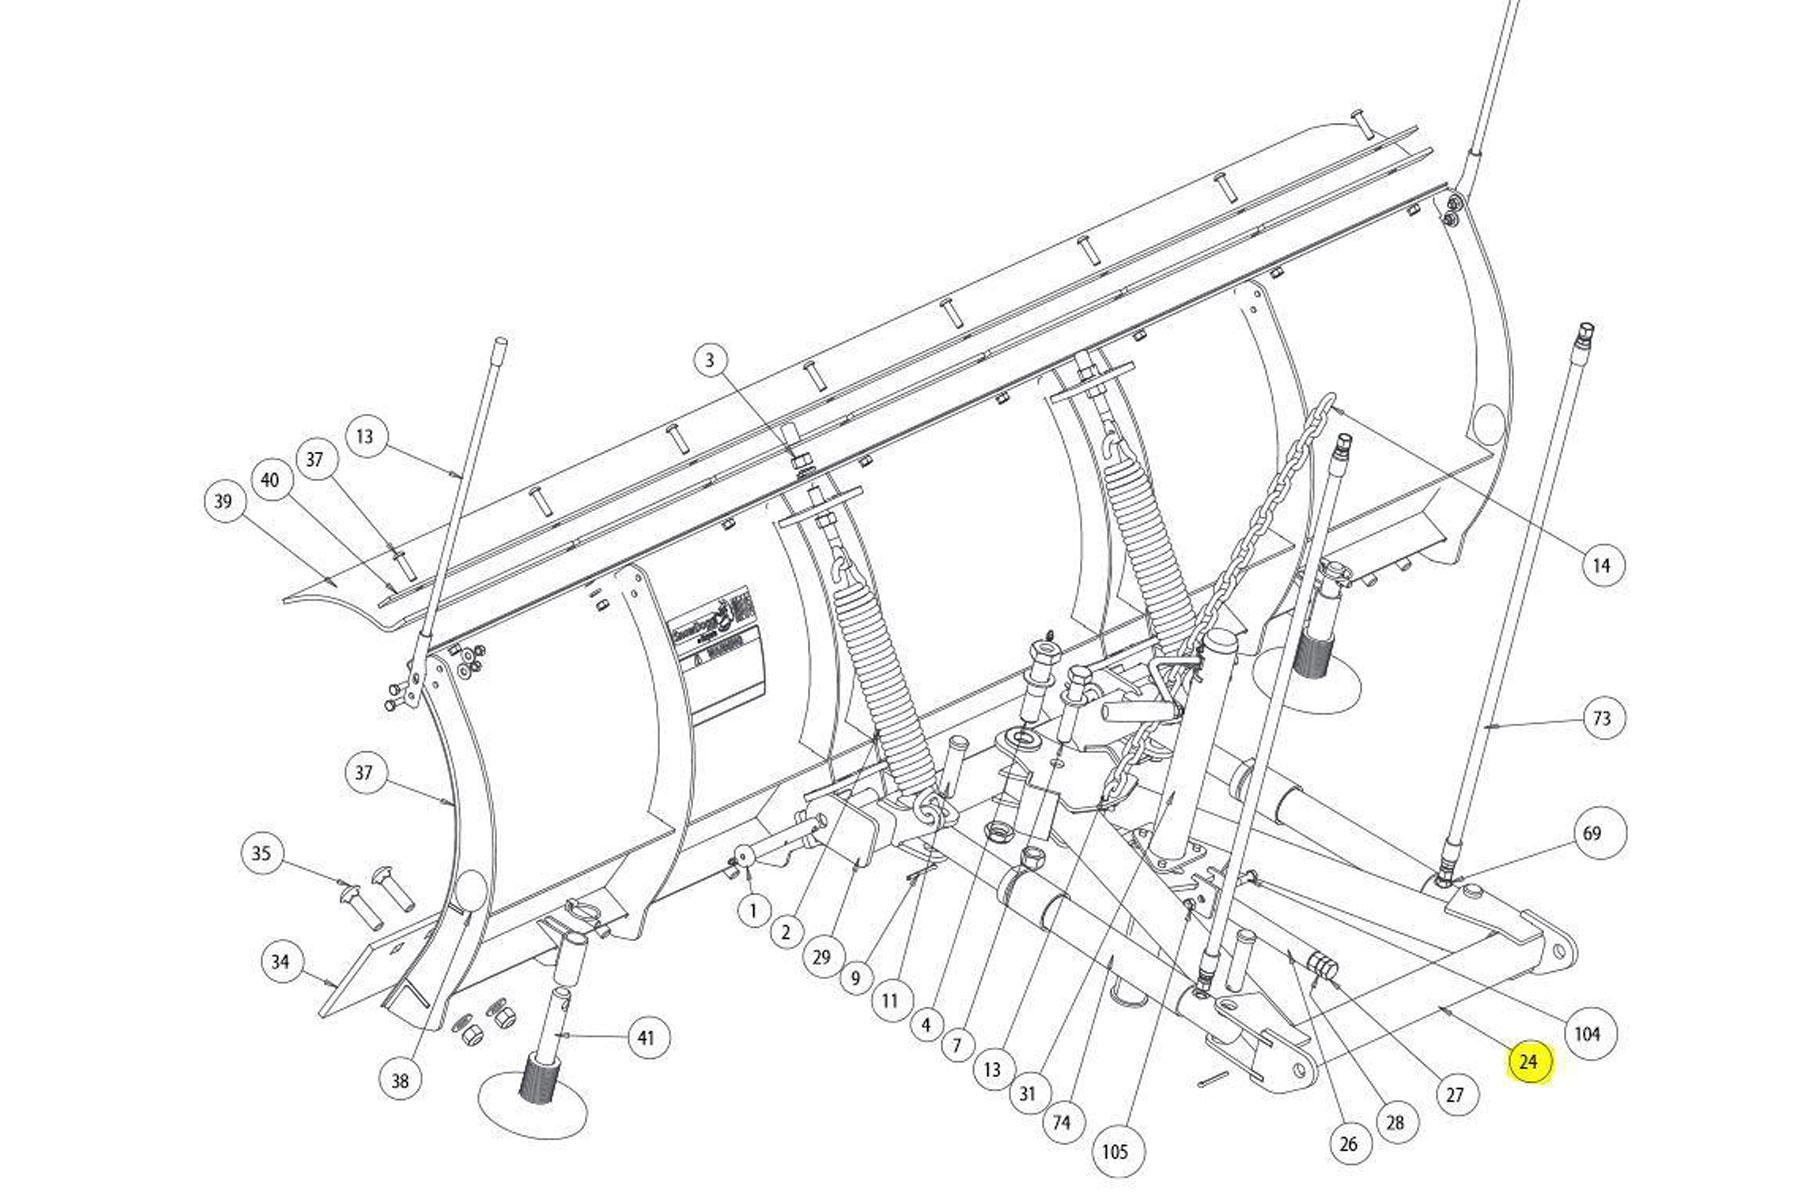 ex 80 wiring diagram snowdogg trusted wiring diagrams snowdogg plow coils snow dogg wiring harness fisher snow plow light wiring diagram snapper wiring diagram ex 80 wiring diagram snowdogg